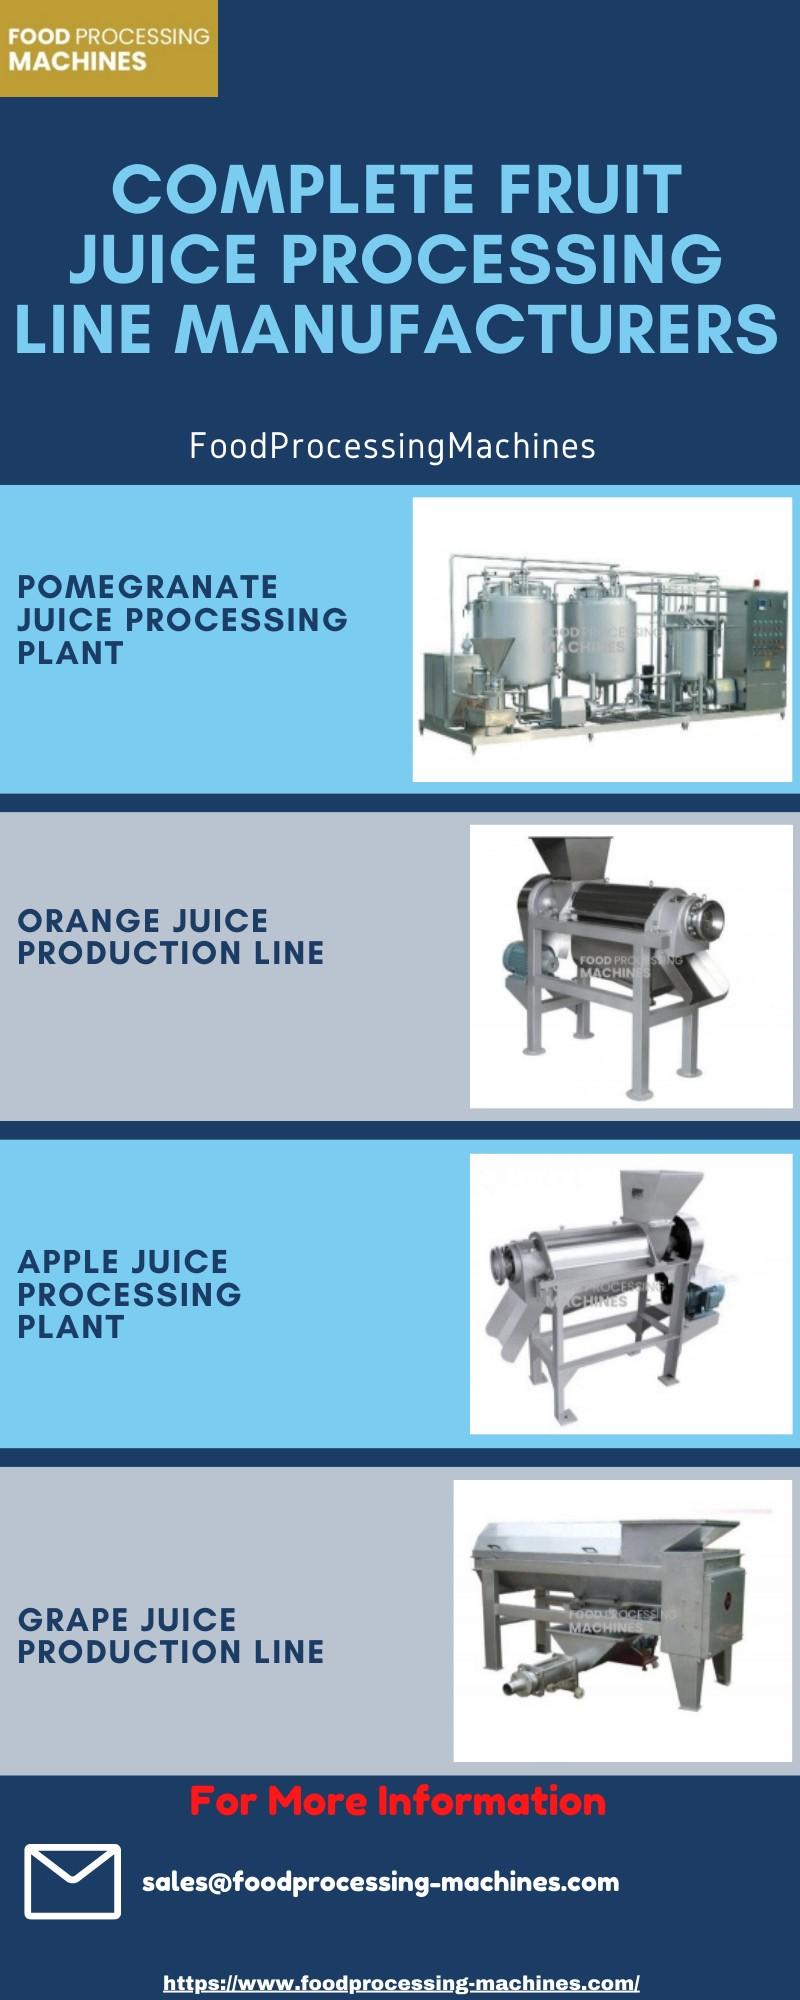 Complete Fruit Juice Processing Line Manufacturers